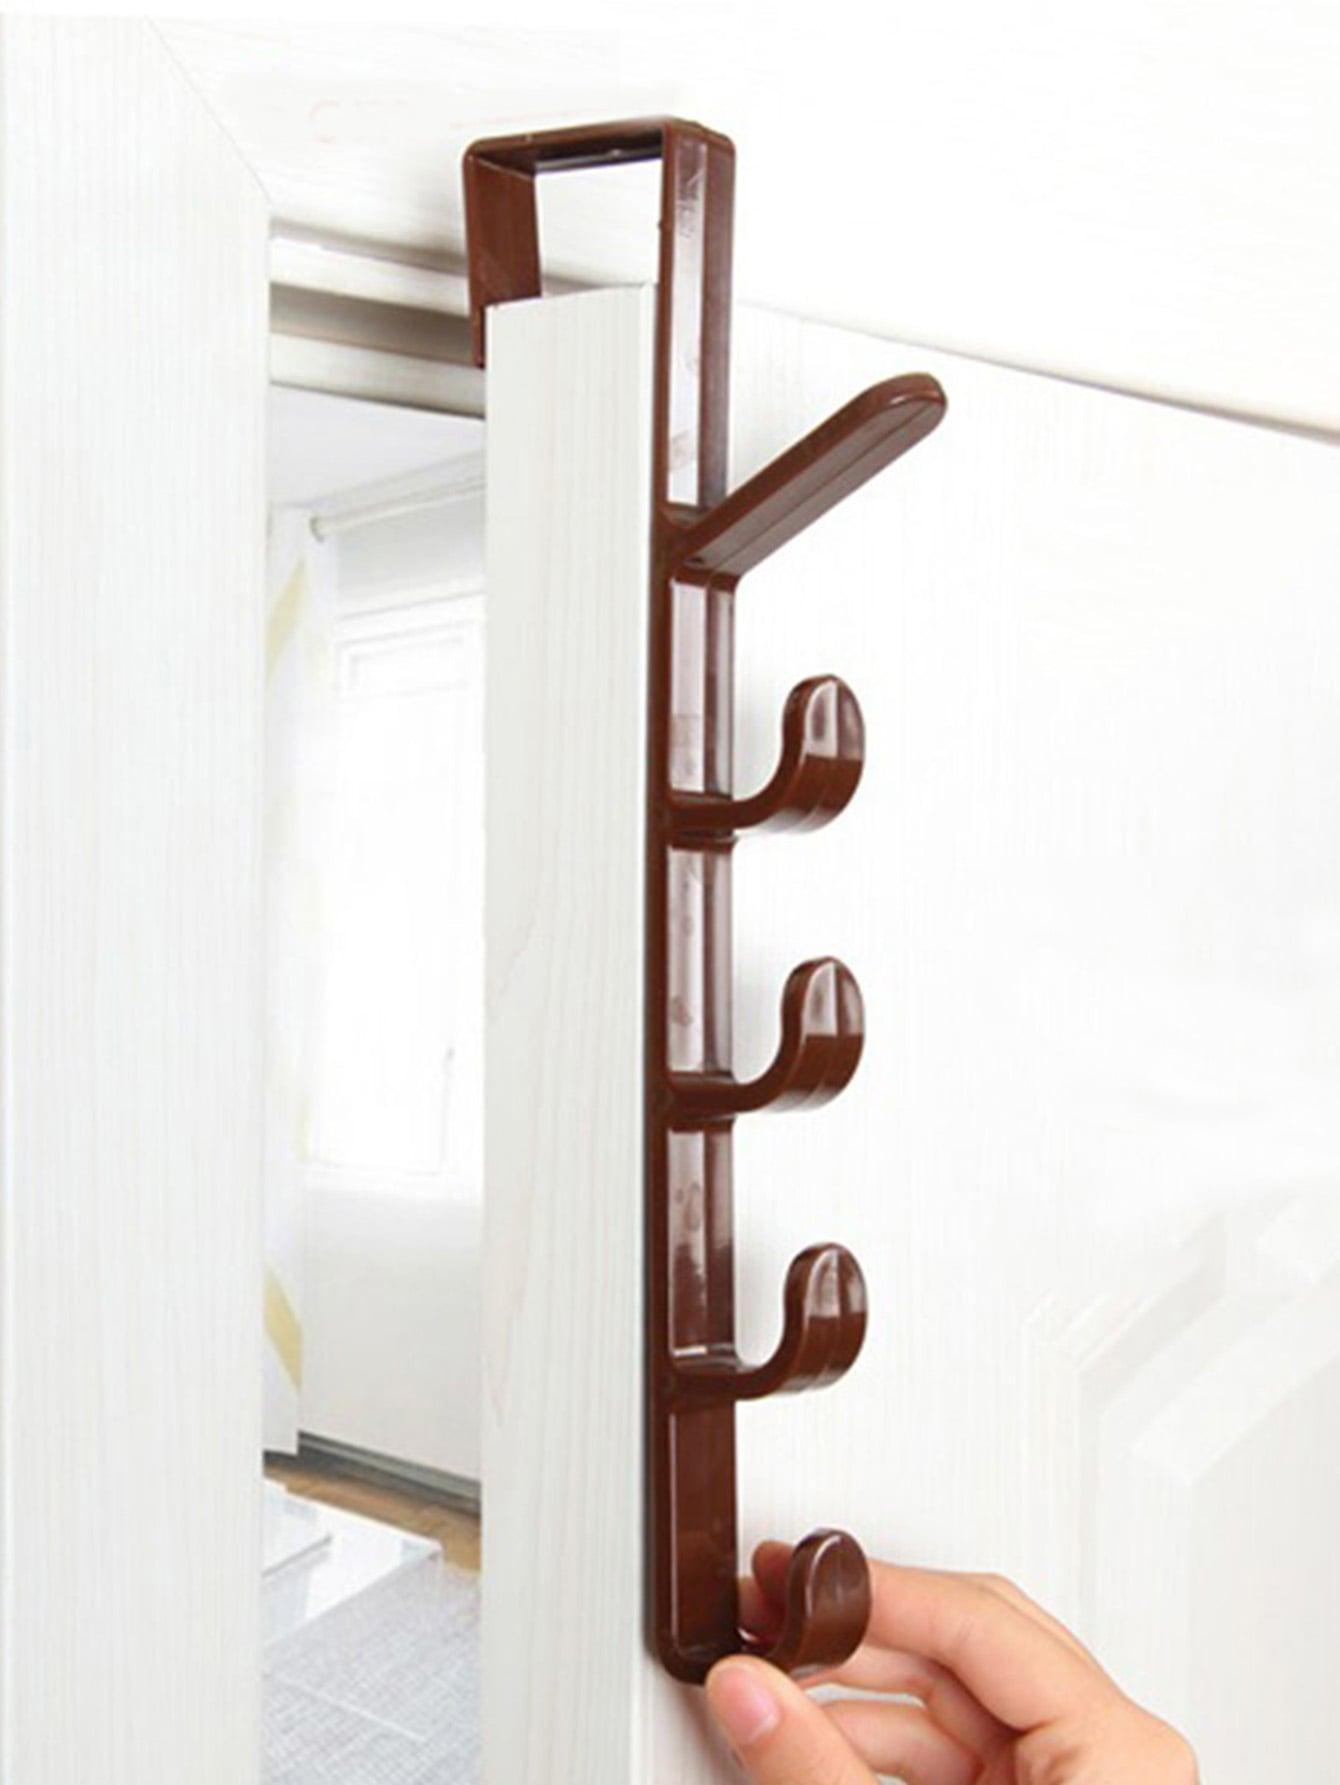 Over The Door 5 Hook Hanger [ fly eagle ]free shipping blue bird over door stainless steel hook holder hanger for kitchen